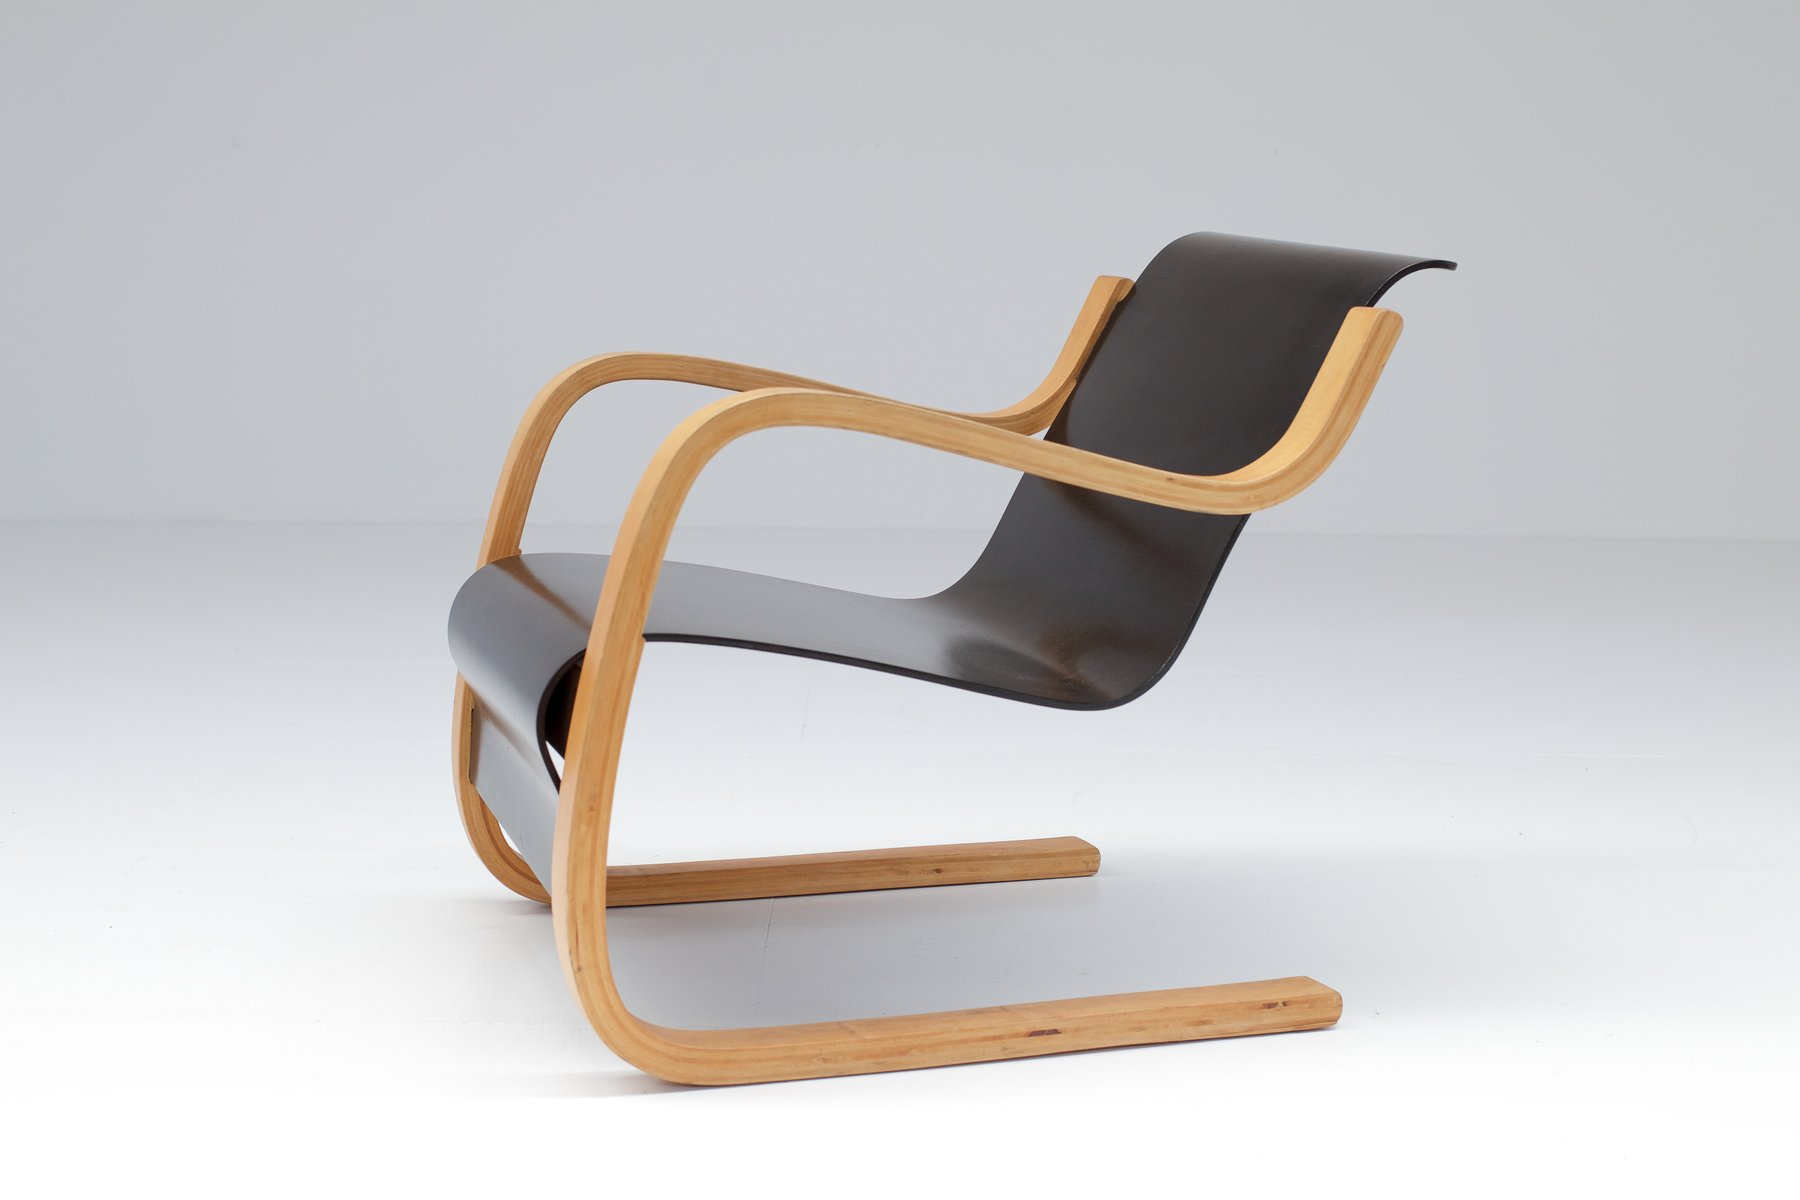 Vintage model 31 armchair by alvar aalto for finmar for Alvar aalto chaise